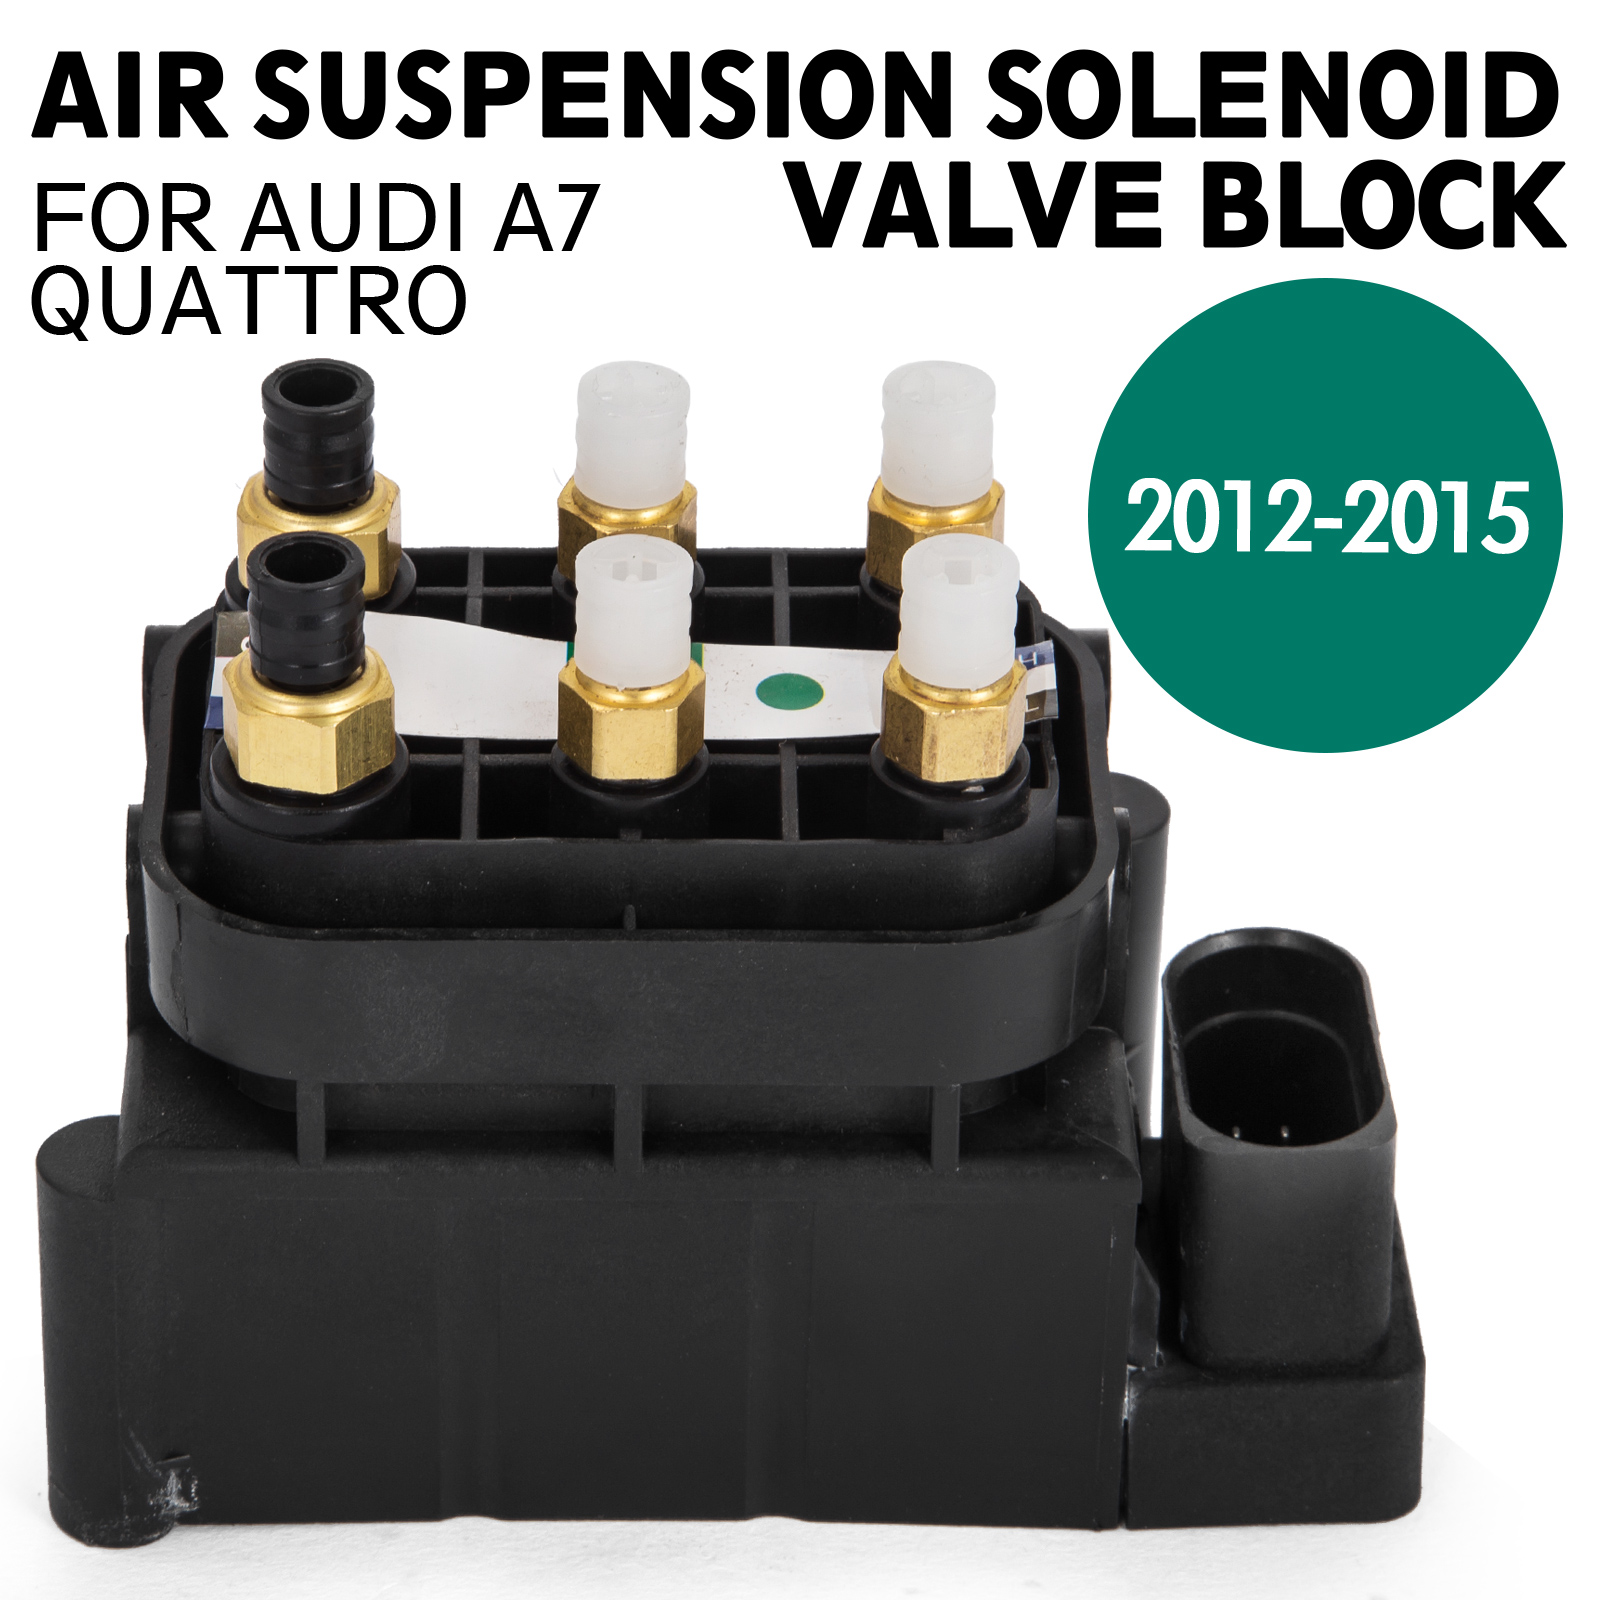 de Air Ride Suspension Solenoid Valve Block For Audi A7 Quattro 4H0616013A al